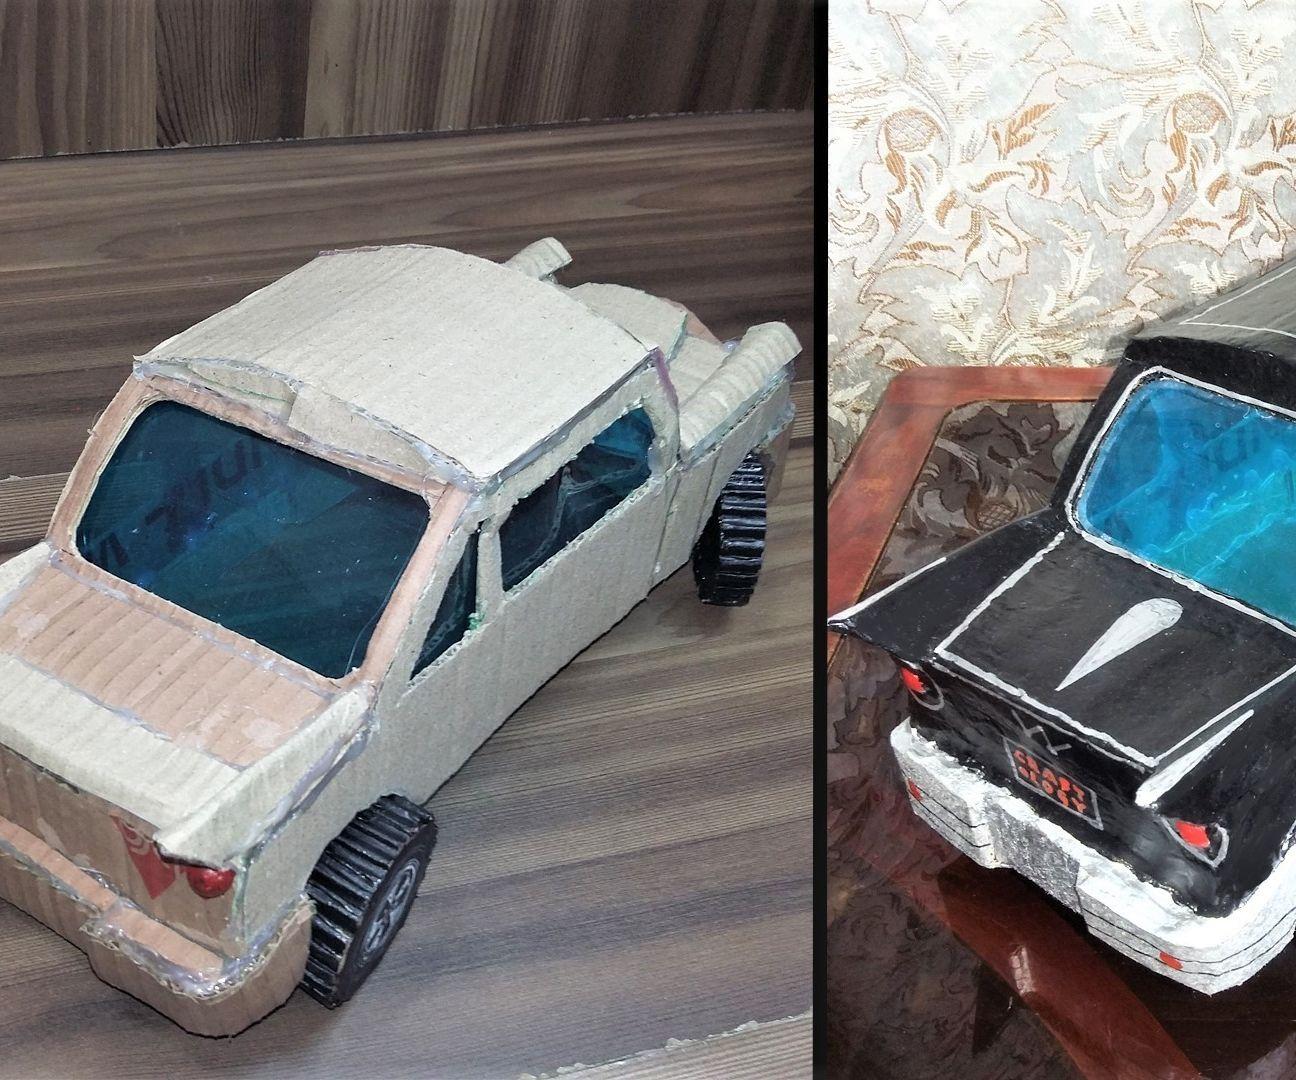 How to Make Model of Car From Cardboard|New Easy Art & Craft Tutorial Cardboard Car